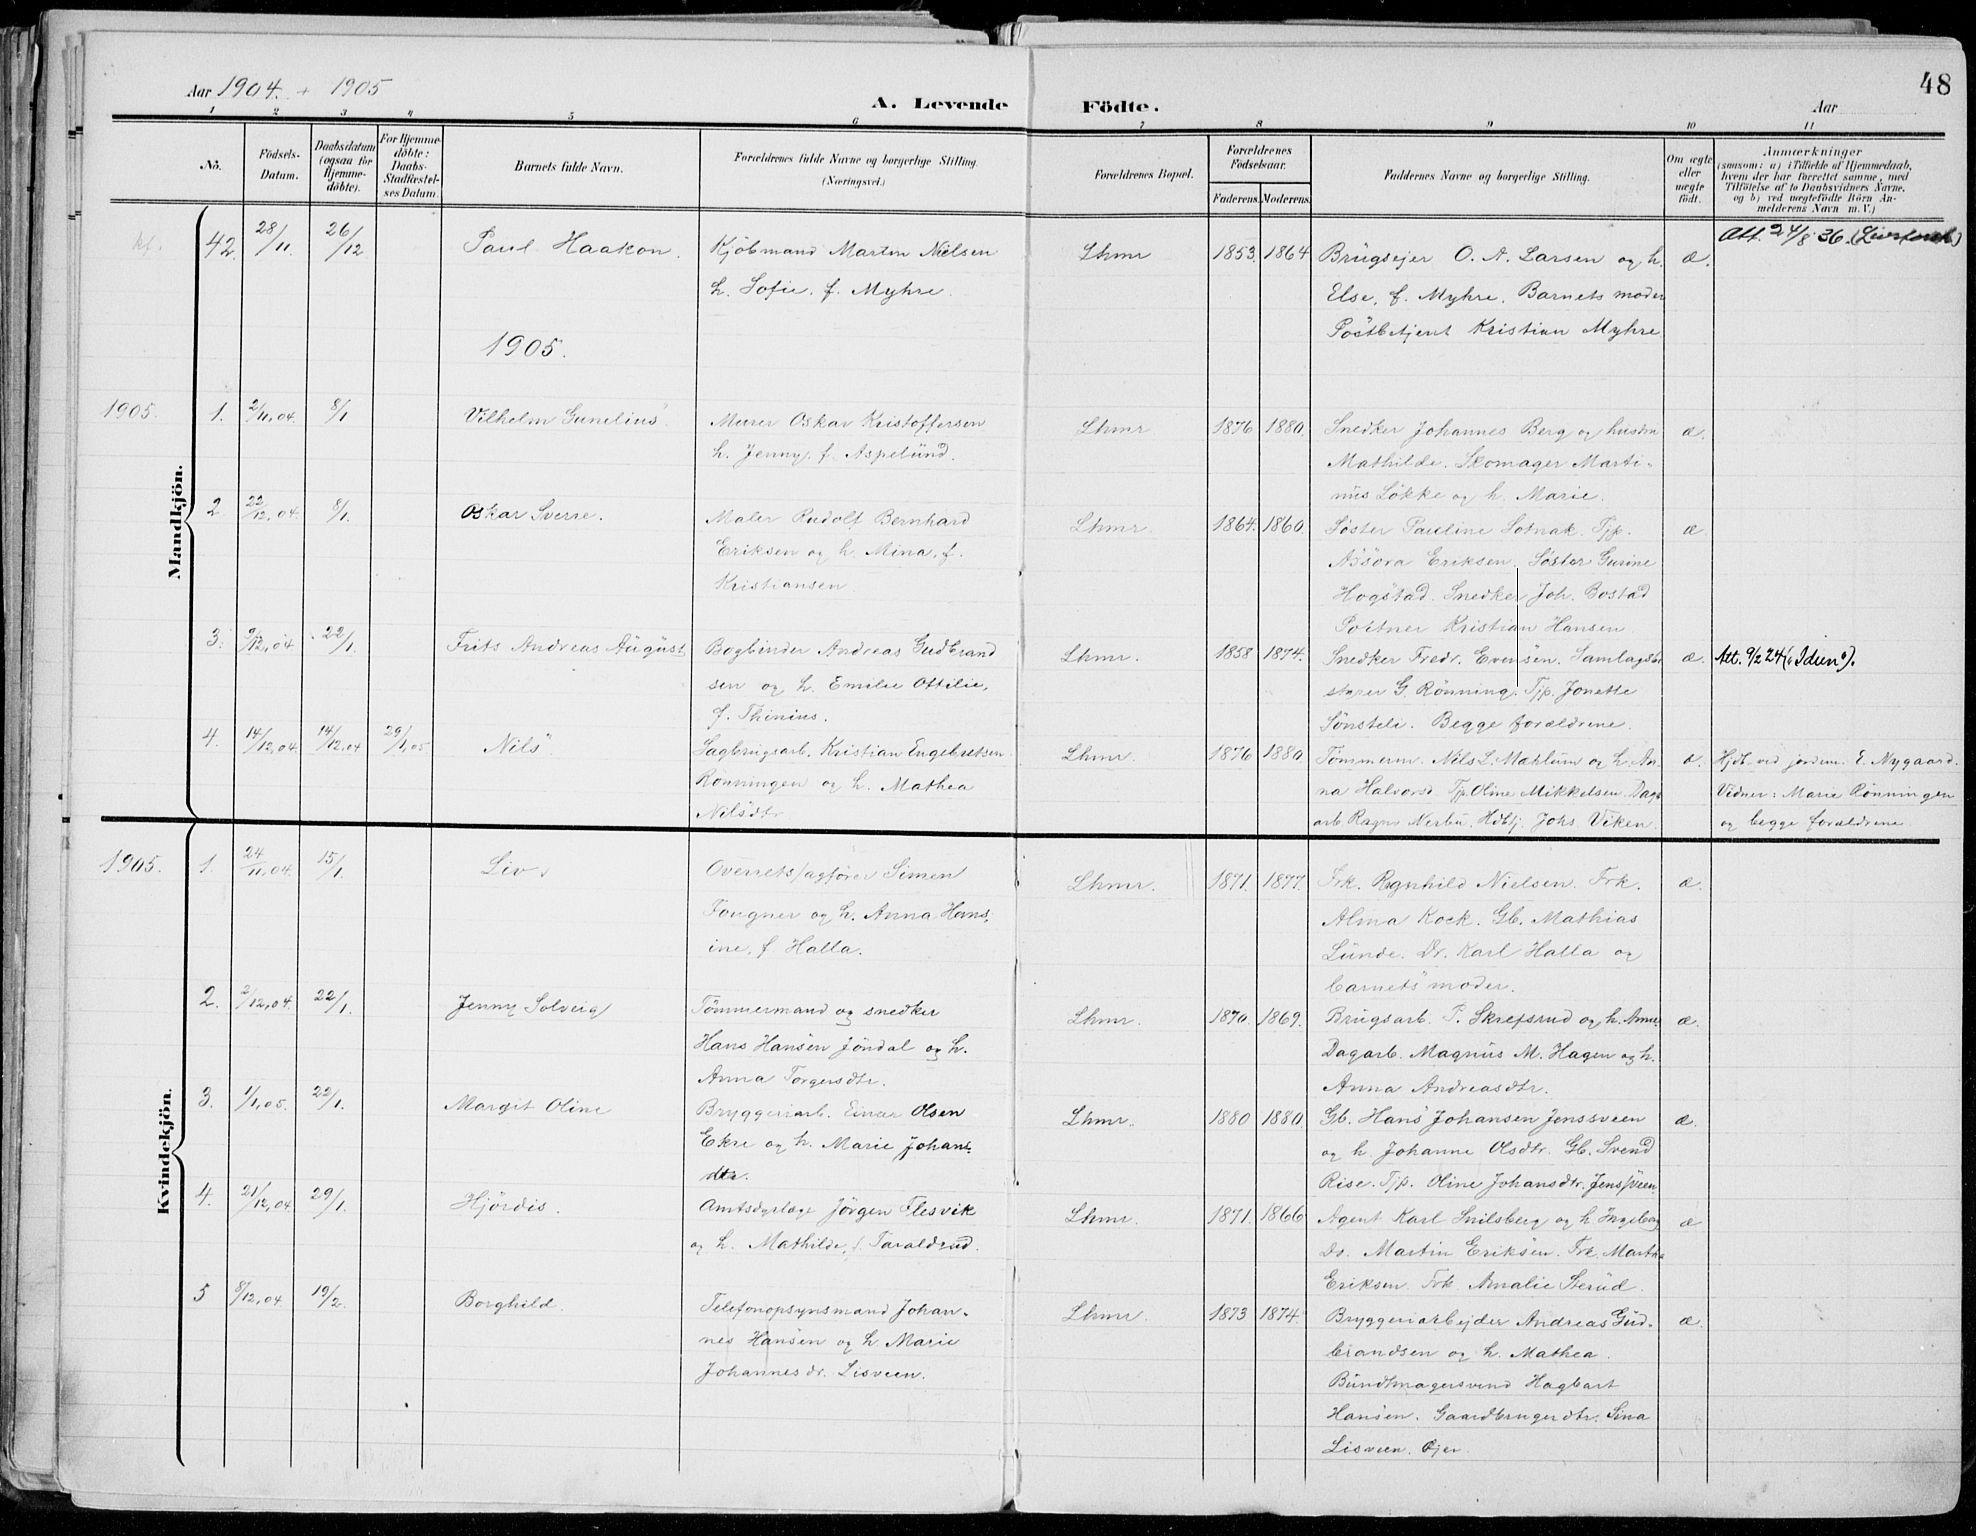 SAH, Lillehammer prestekontor, Ministerialbok nr. 1, 1901-1916, s. 48